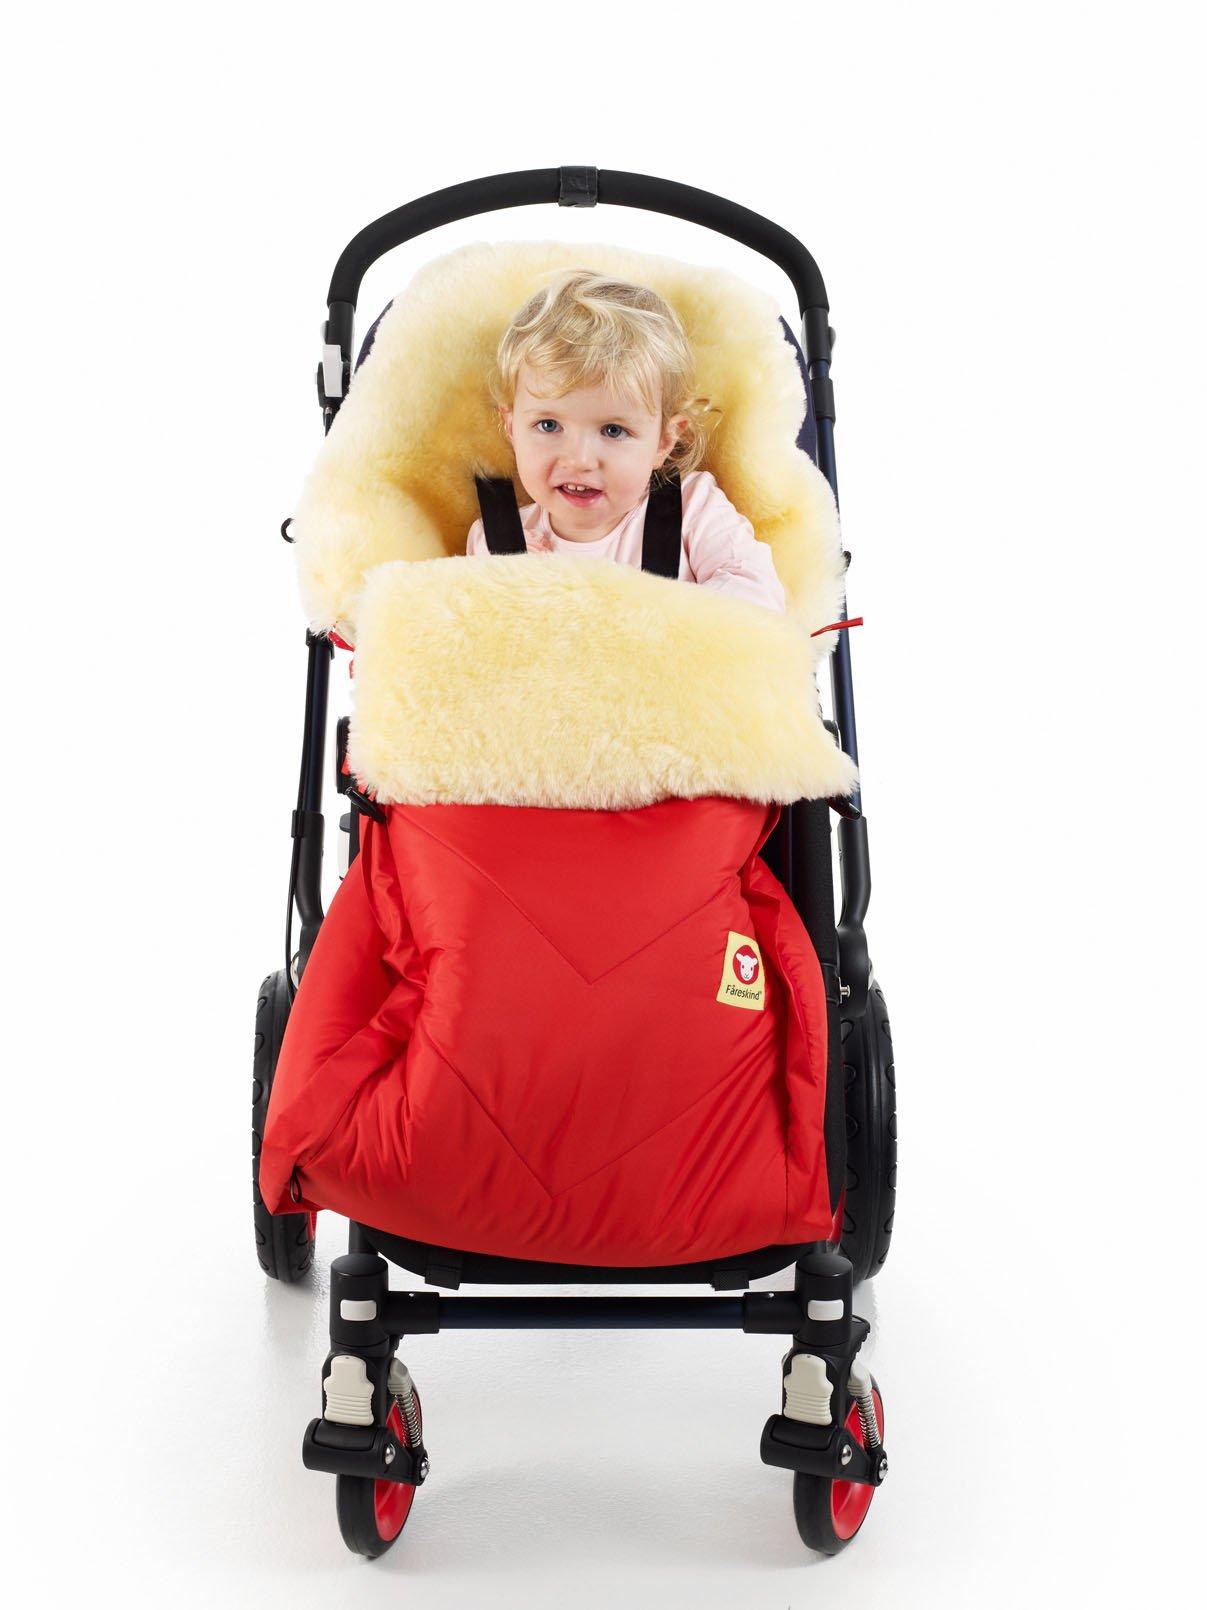 Fareskind Baby Go Comfy Sheepskin Bunting Bag, Red, 6-36 Months